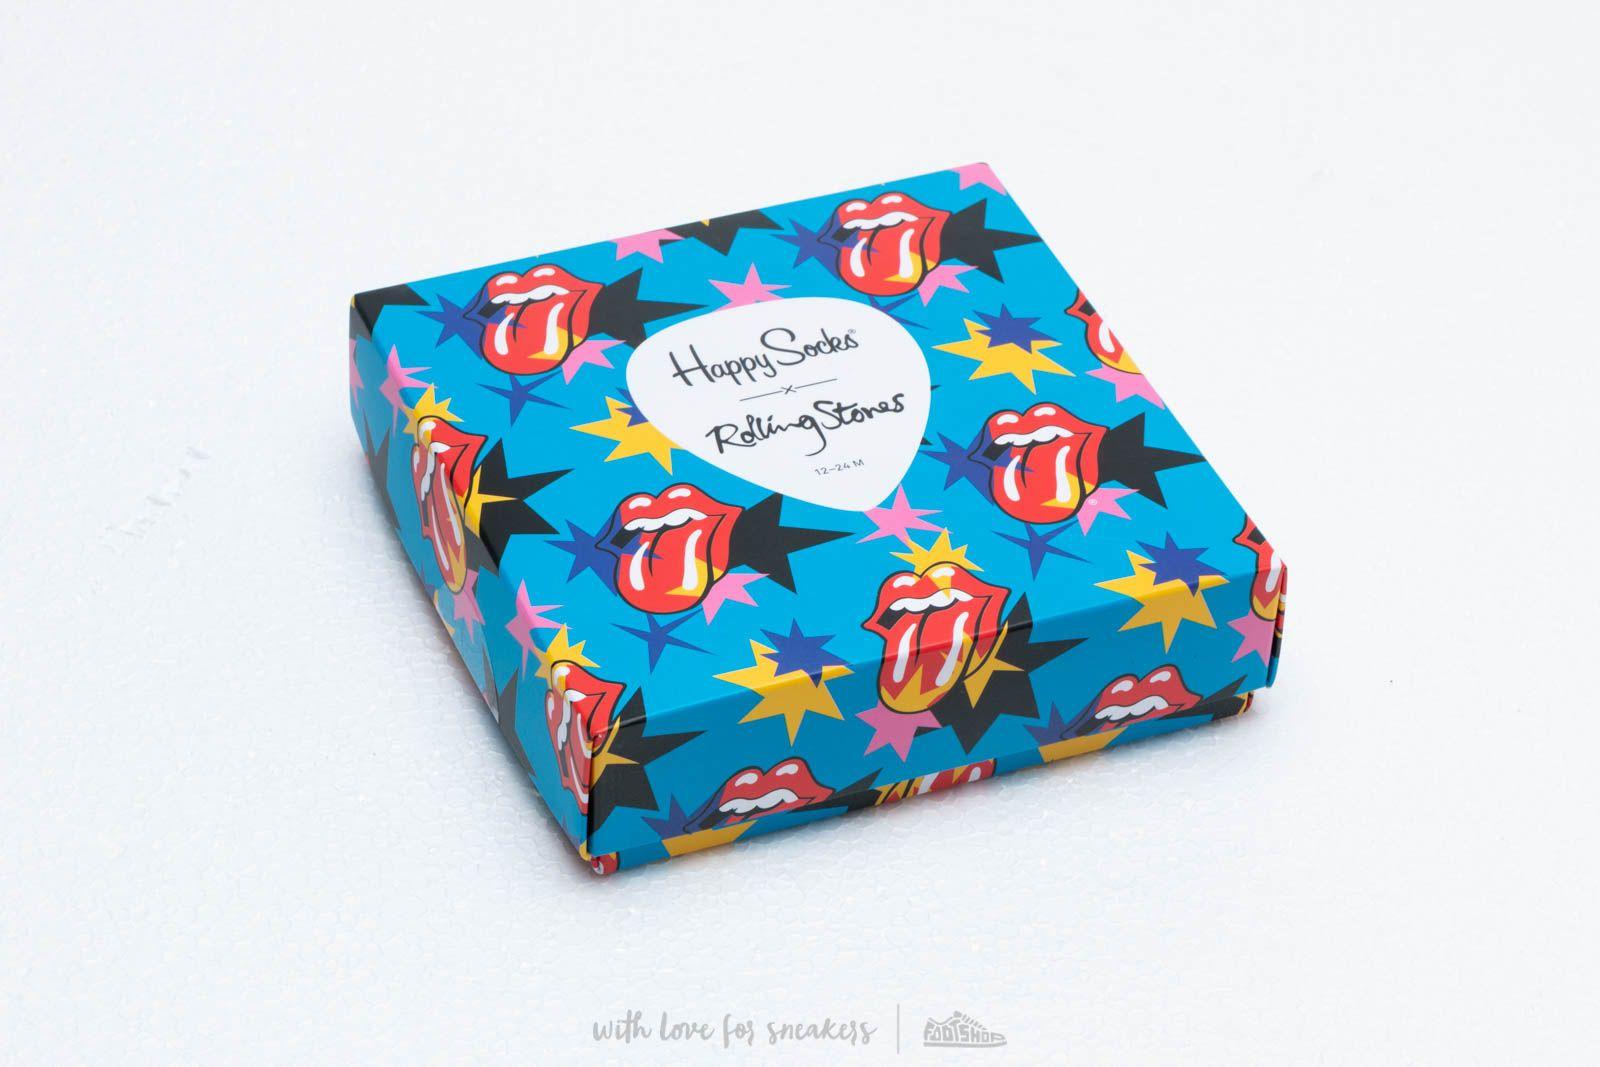 Ponožky Happy Socks Kids Rolling Stones Sock Box Set